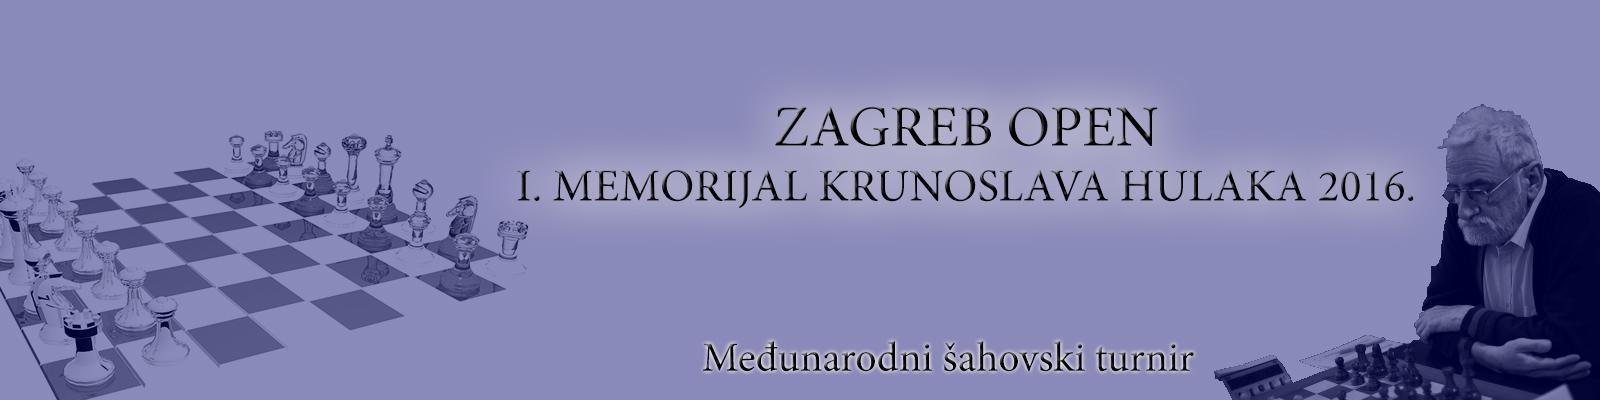 Zagreb Open I. Memorijal Krunoslava Hulaka 2016